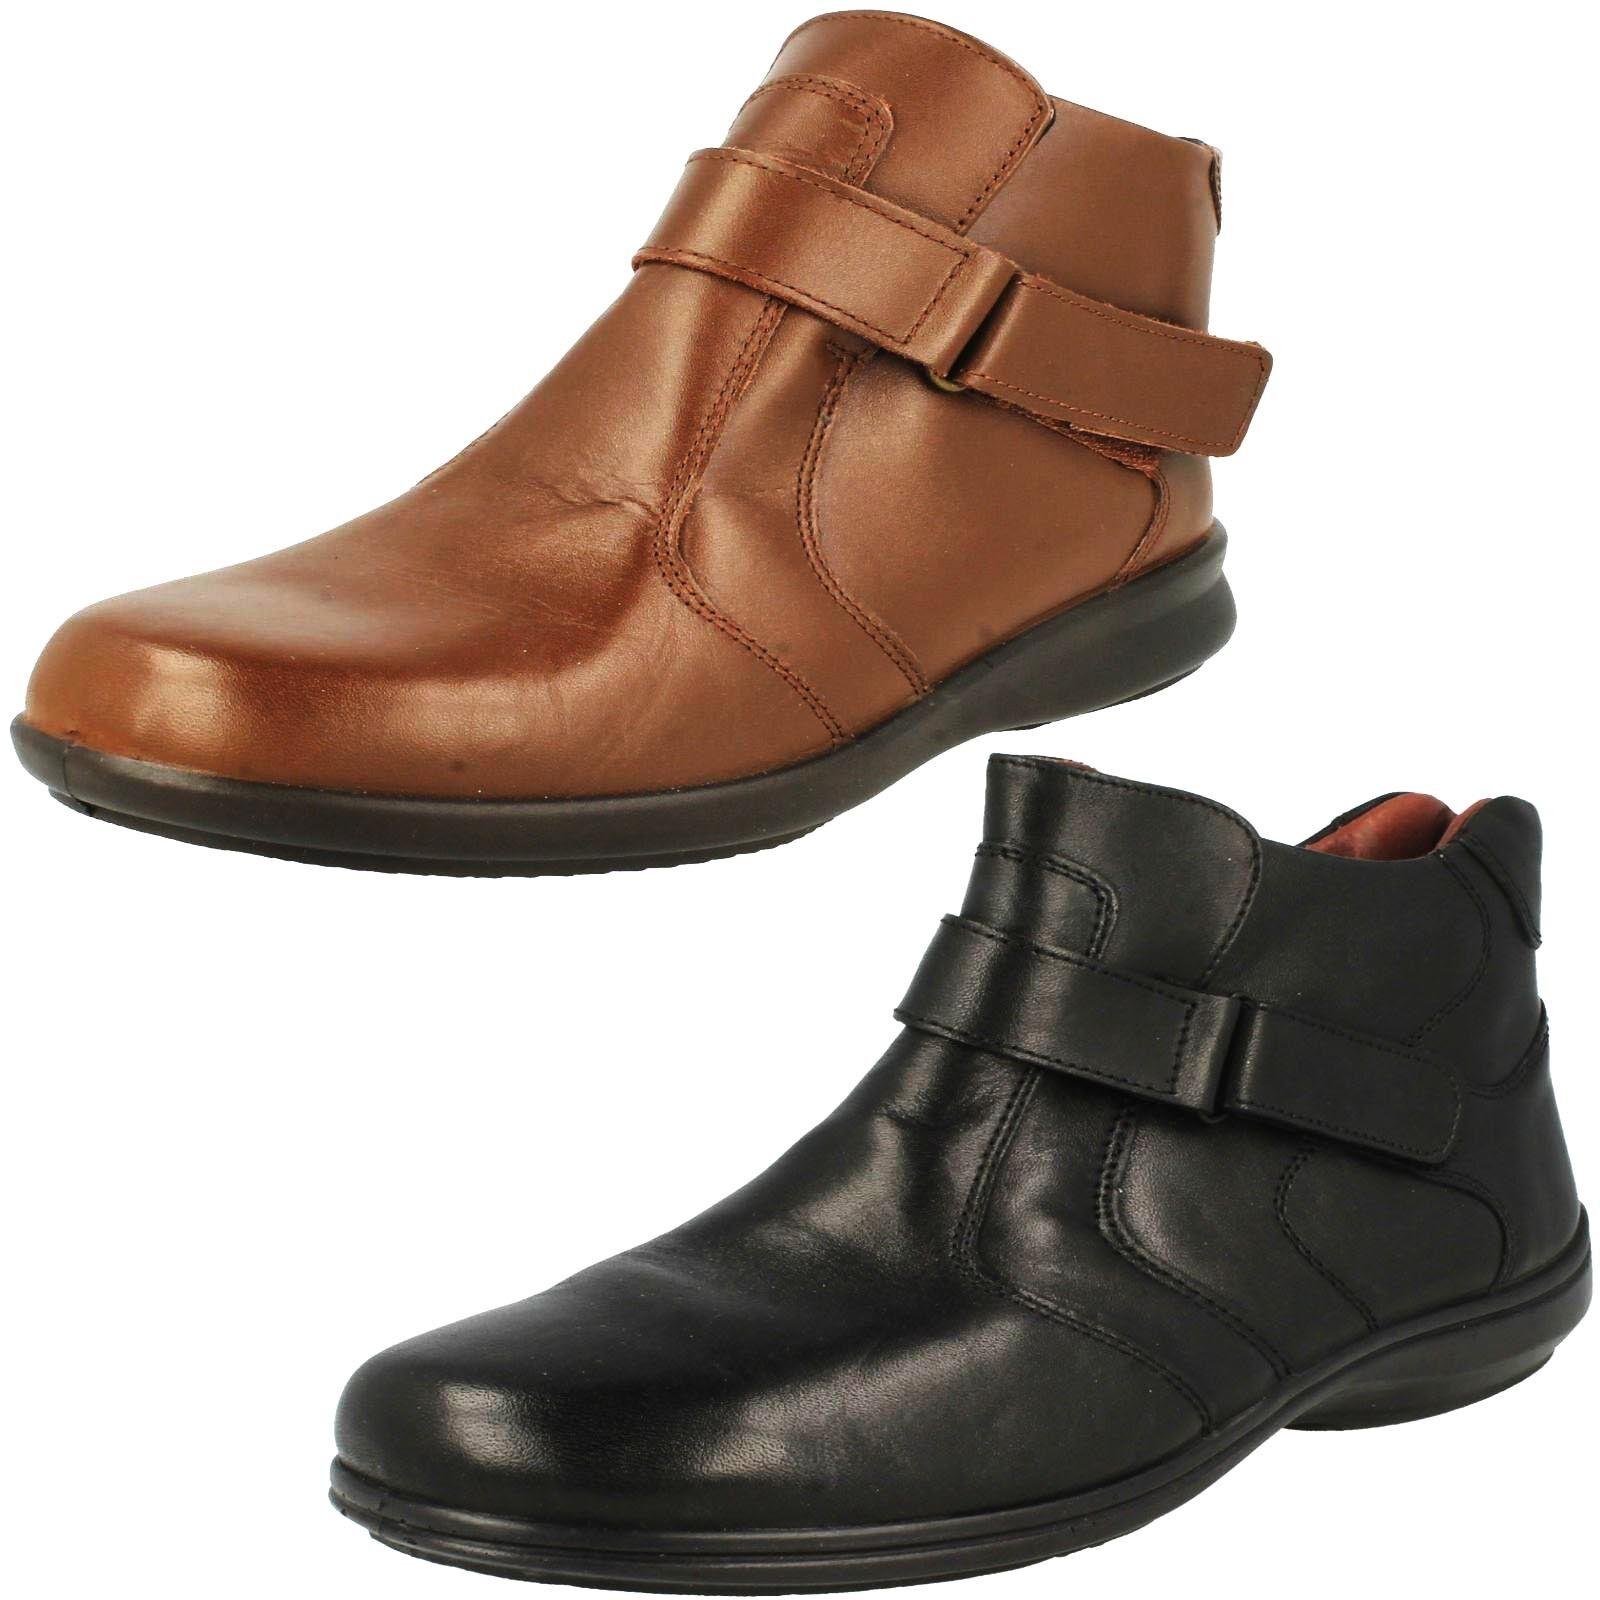 Ladies Easy B Strap Bnkle Boots Truro Wide Fit Ladies Shoes